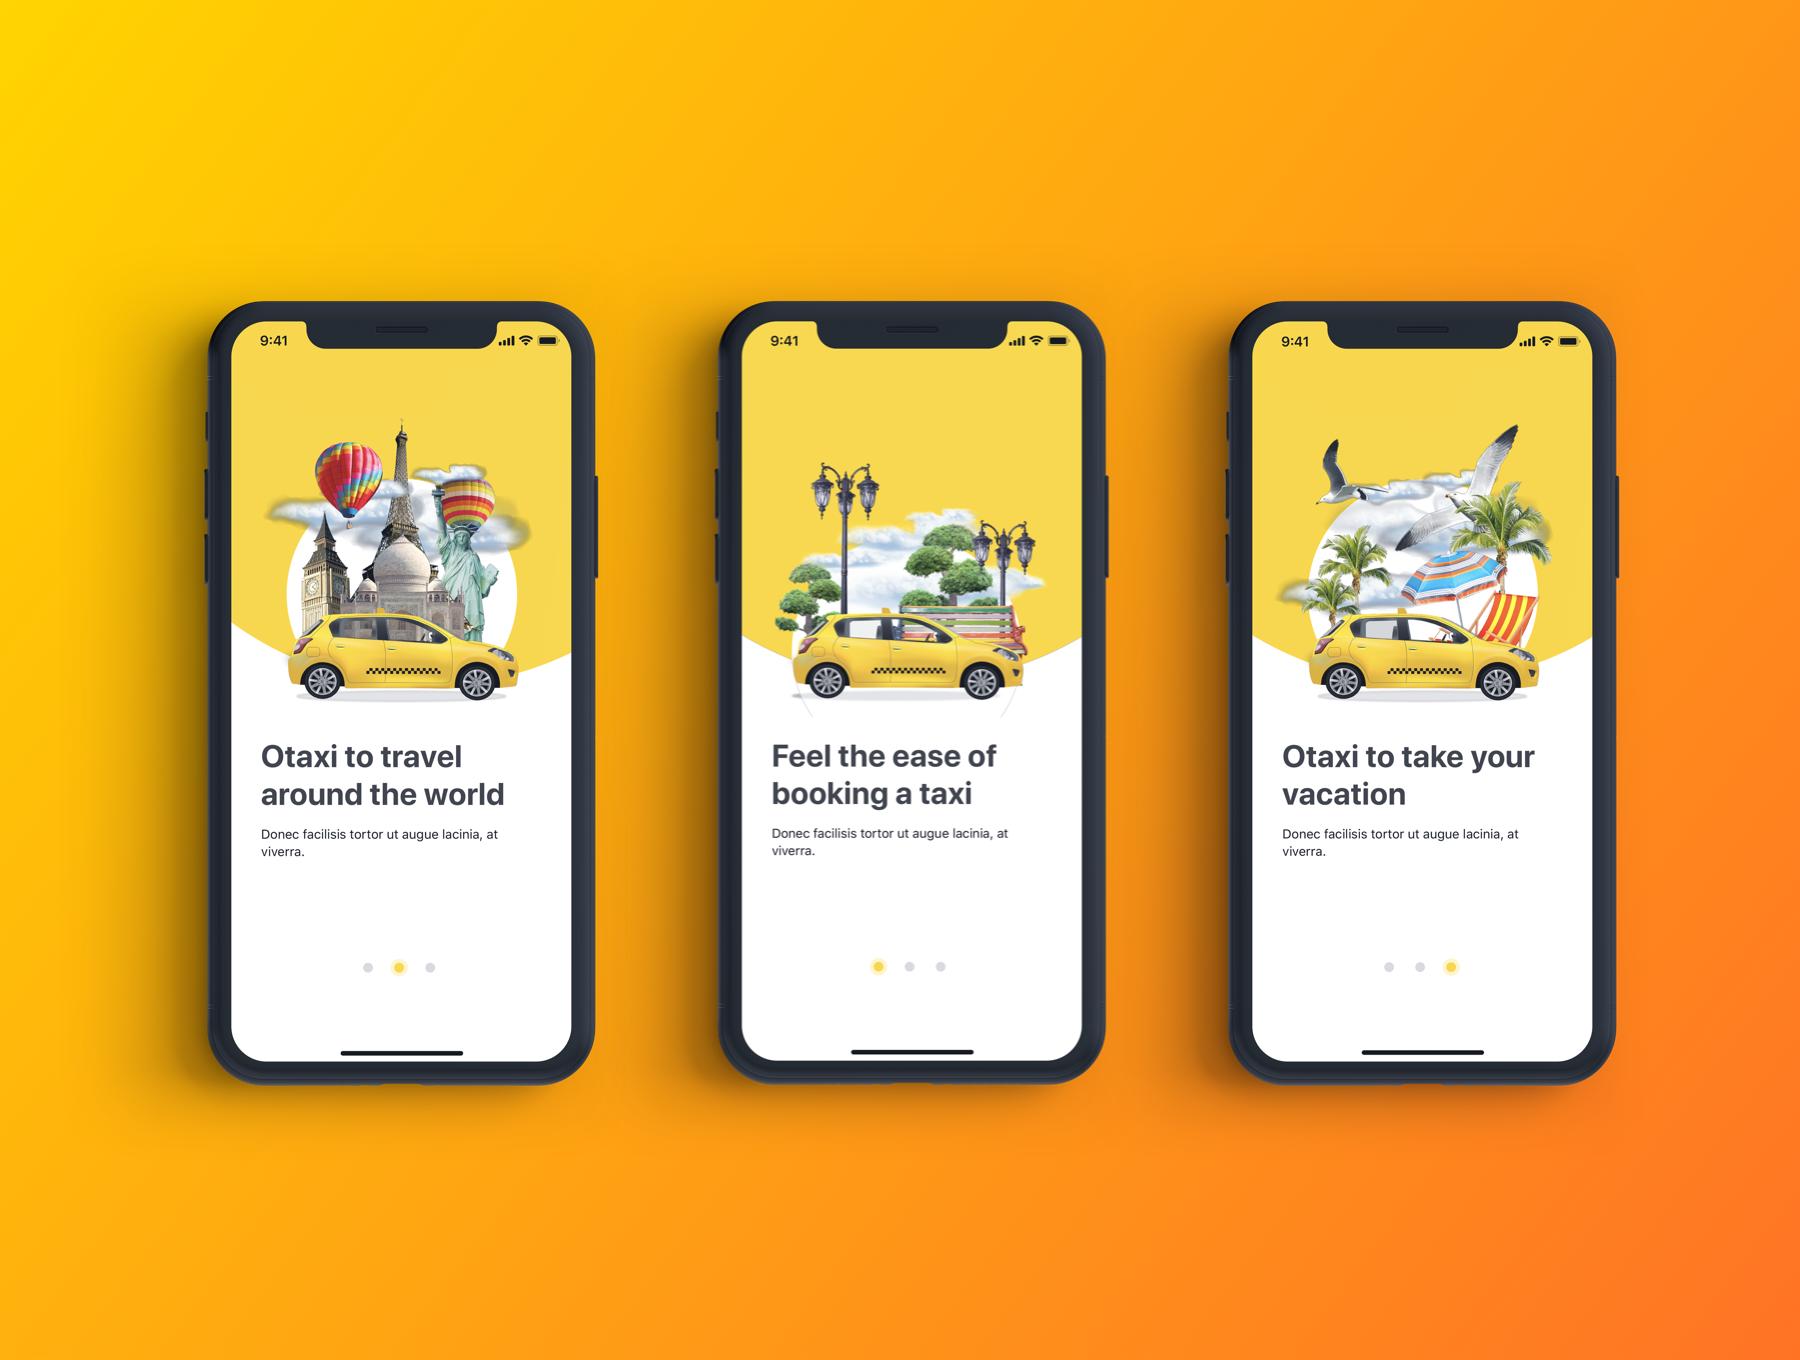 类Uber&滴滴出行叫车APP应用UI设计套件SKETCH模板 Otaxi Mobile UI Kit插图(4)